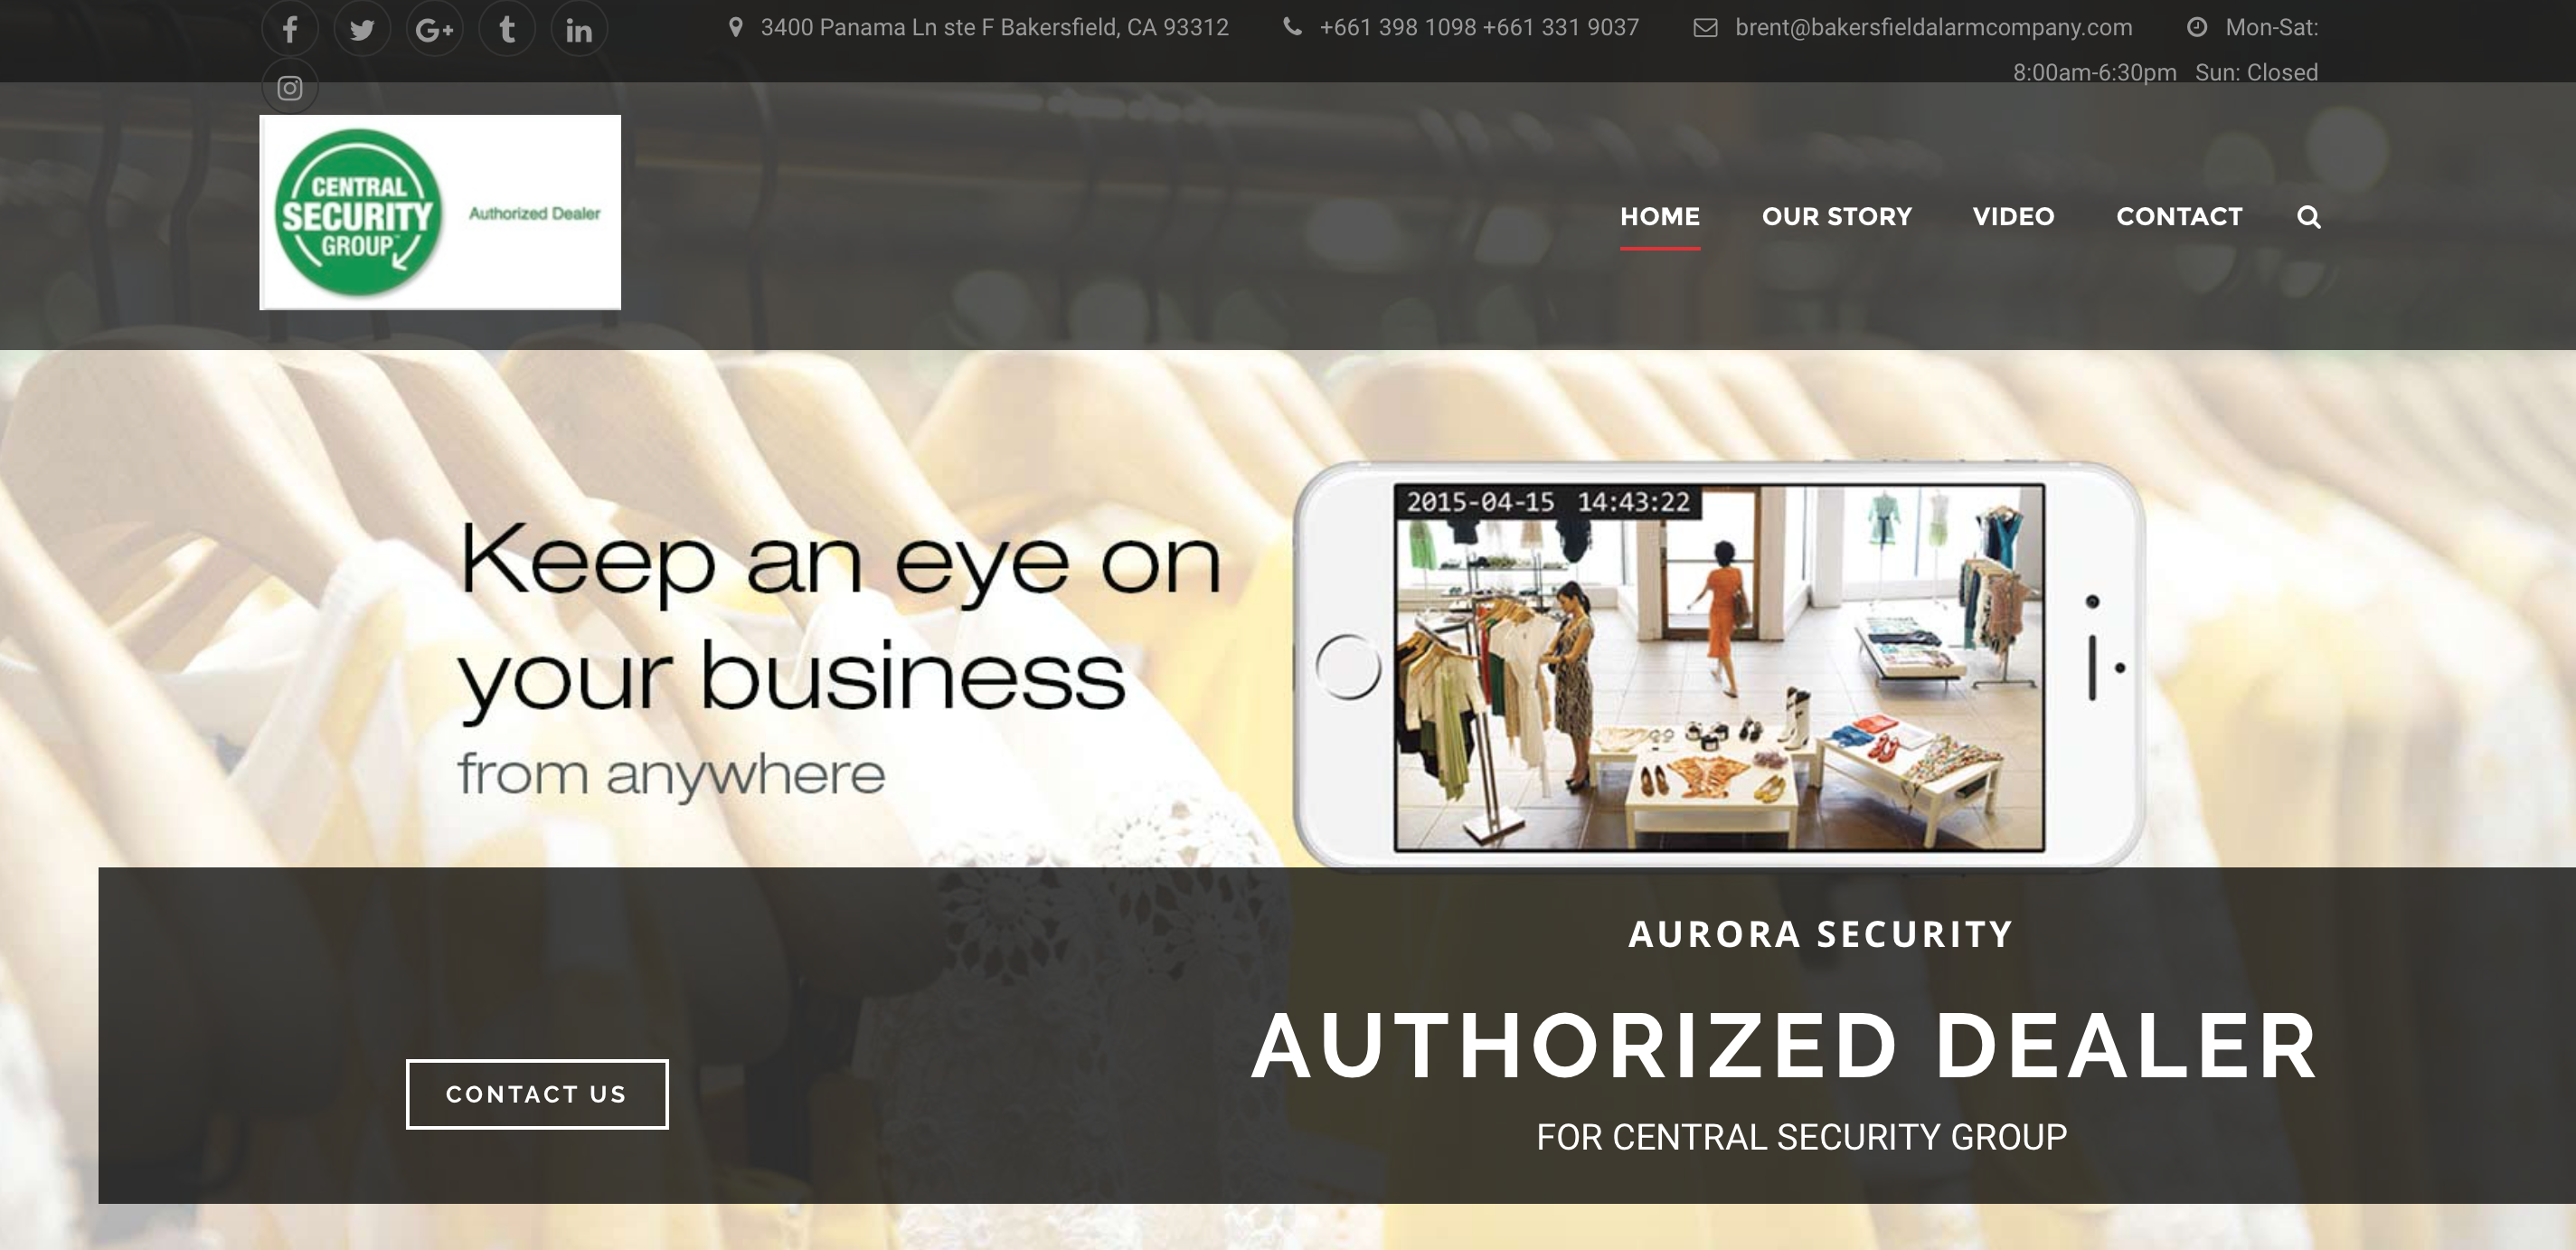 Bakersfield SEO, Website Design & Google Business Help, ACME